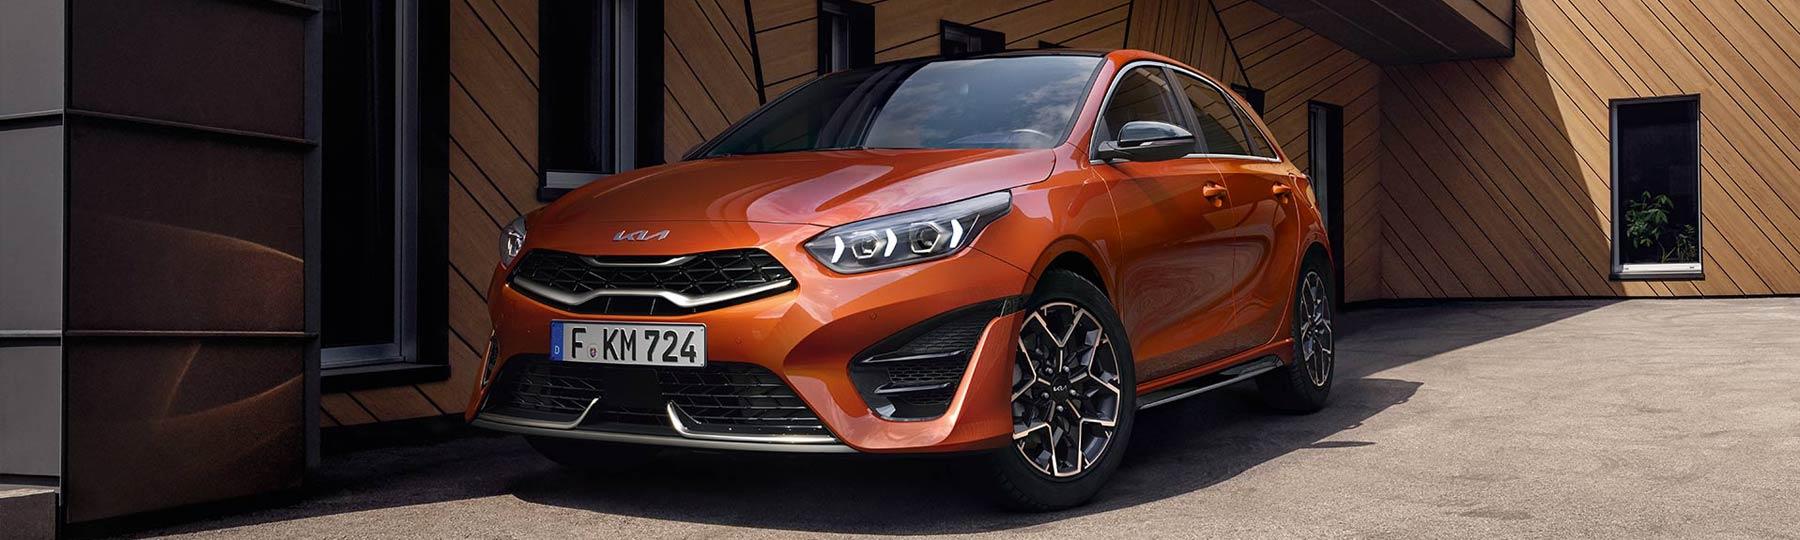 All-New Kia Ceed New Car Offer